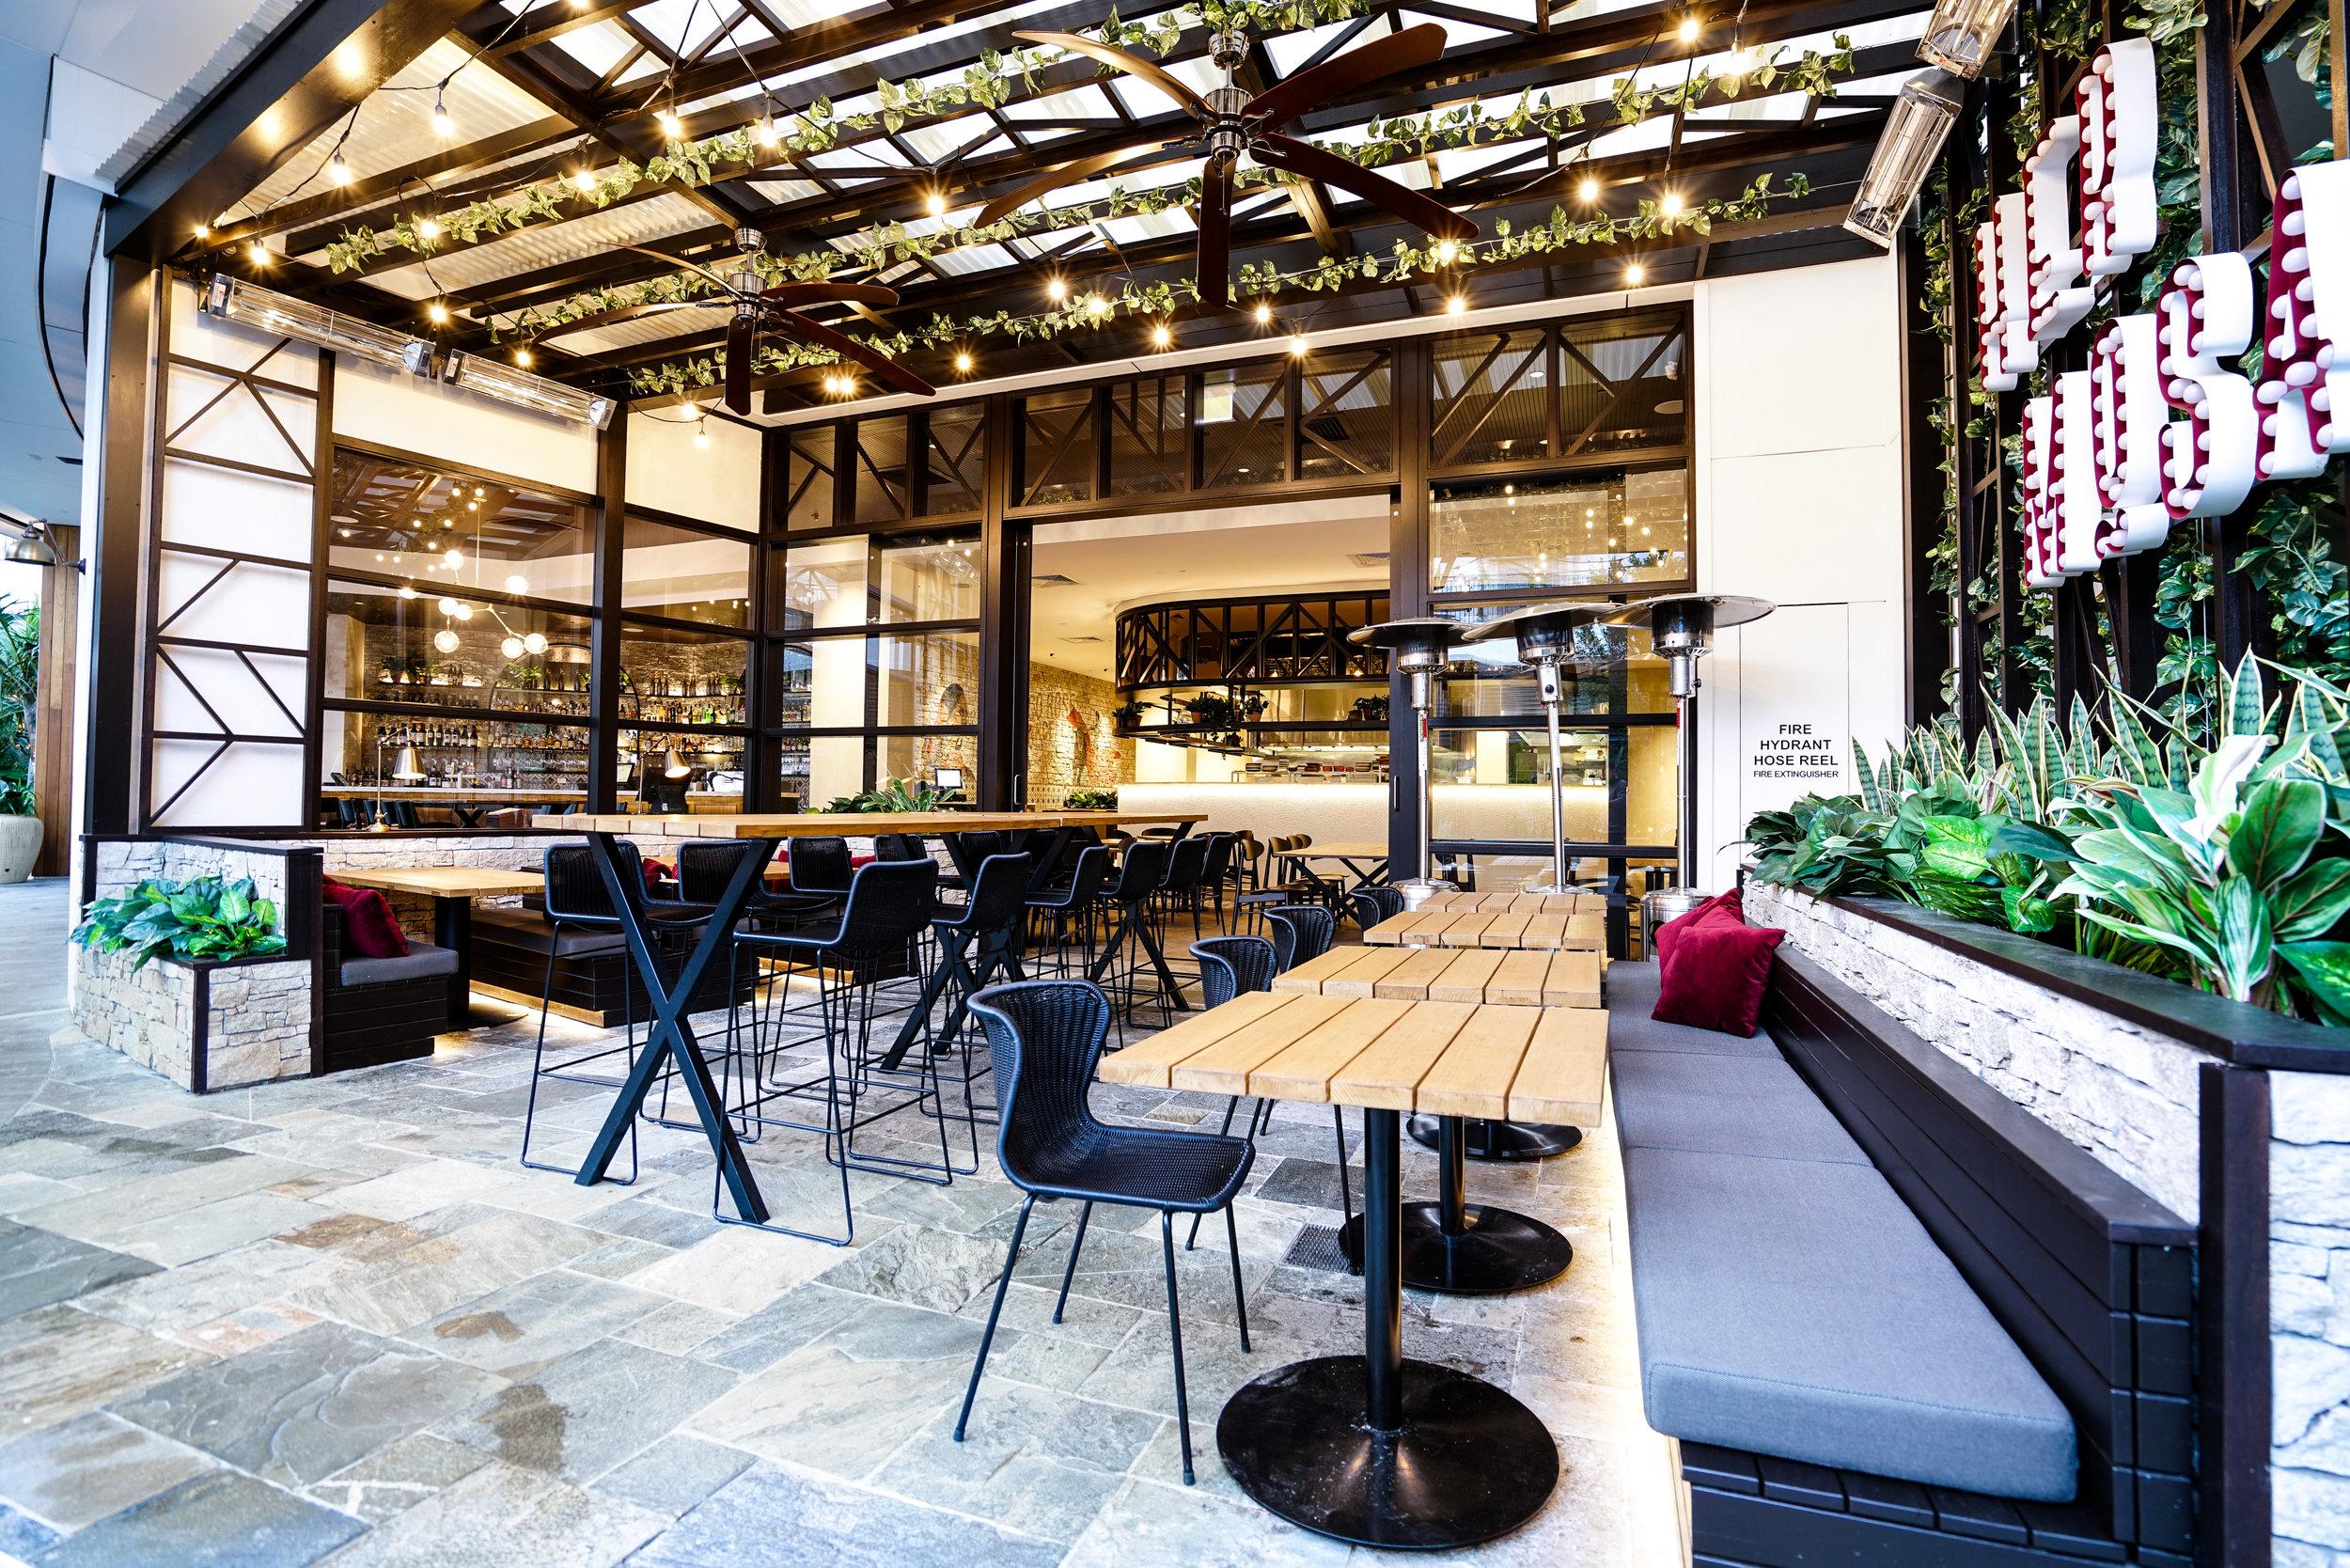 Hermosa Outdoor Dining - Collectivus Interior Design